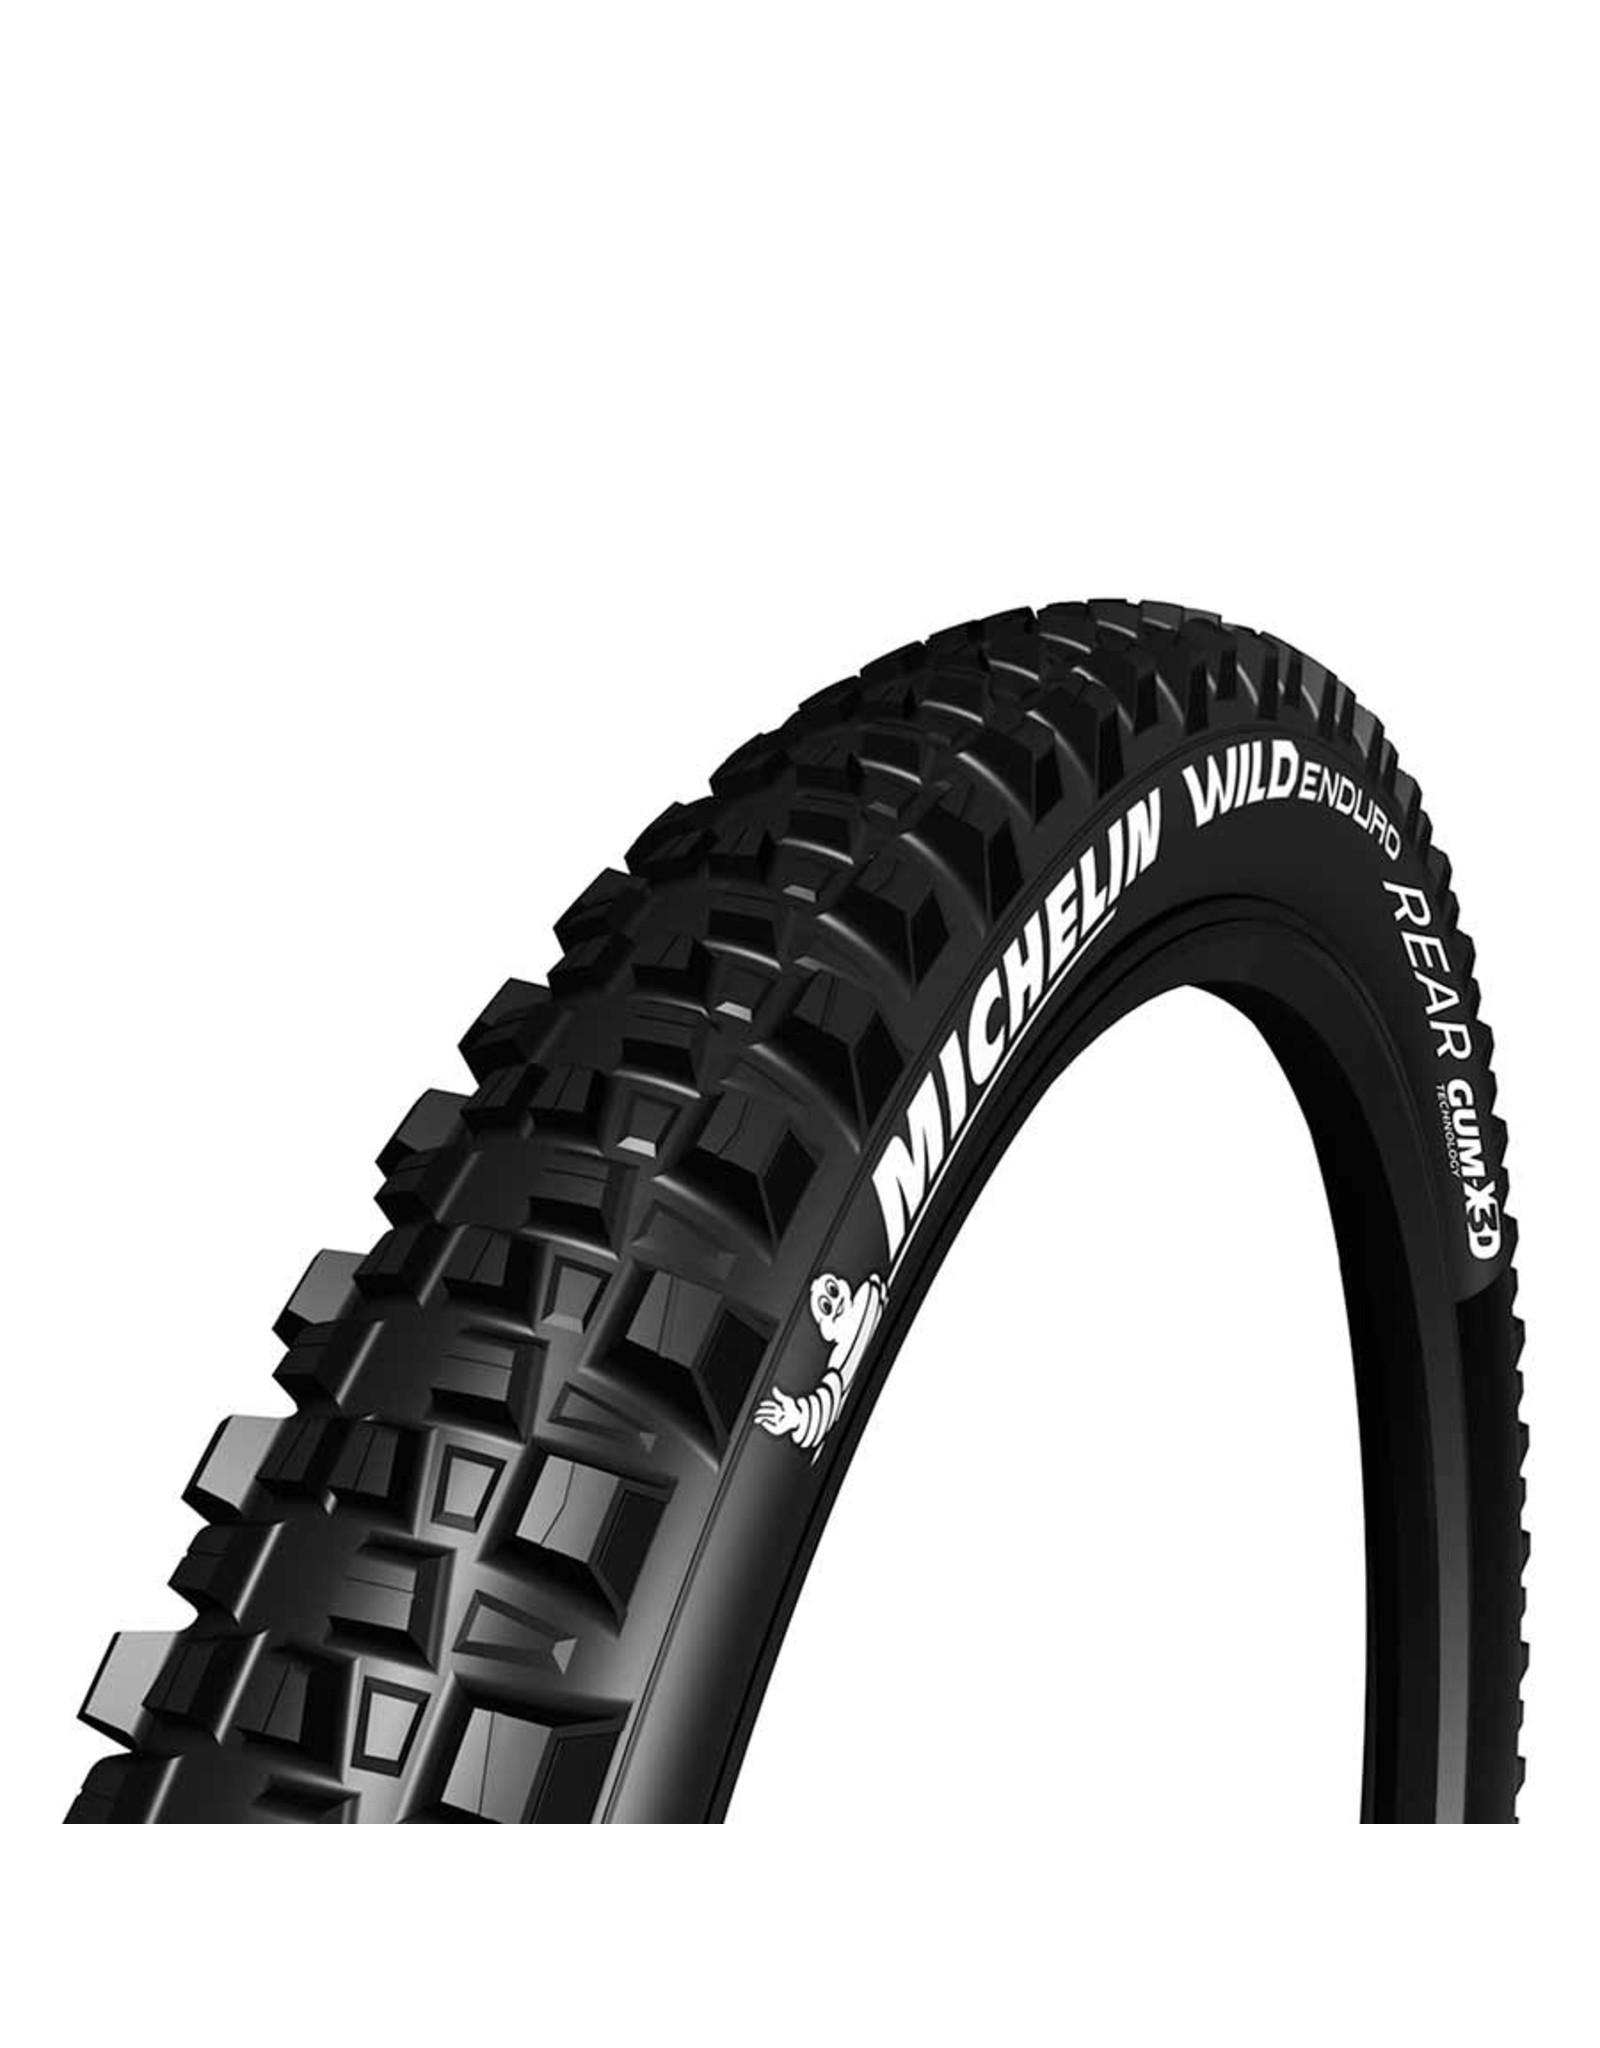 Michelin Michelin, Wild Enduro Front, Tire, 27.5''x2.80, Folding, Tubeless Ready, GUM-X, GravityShield, 3x33TPI, Black